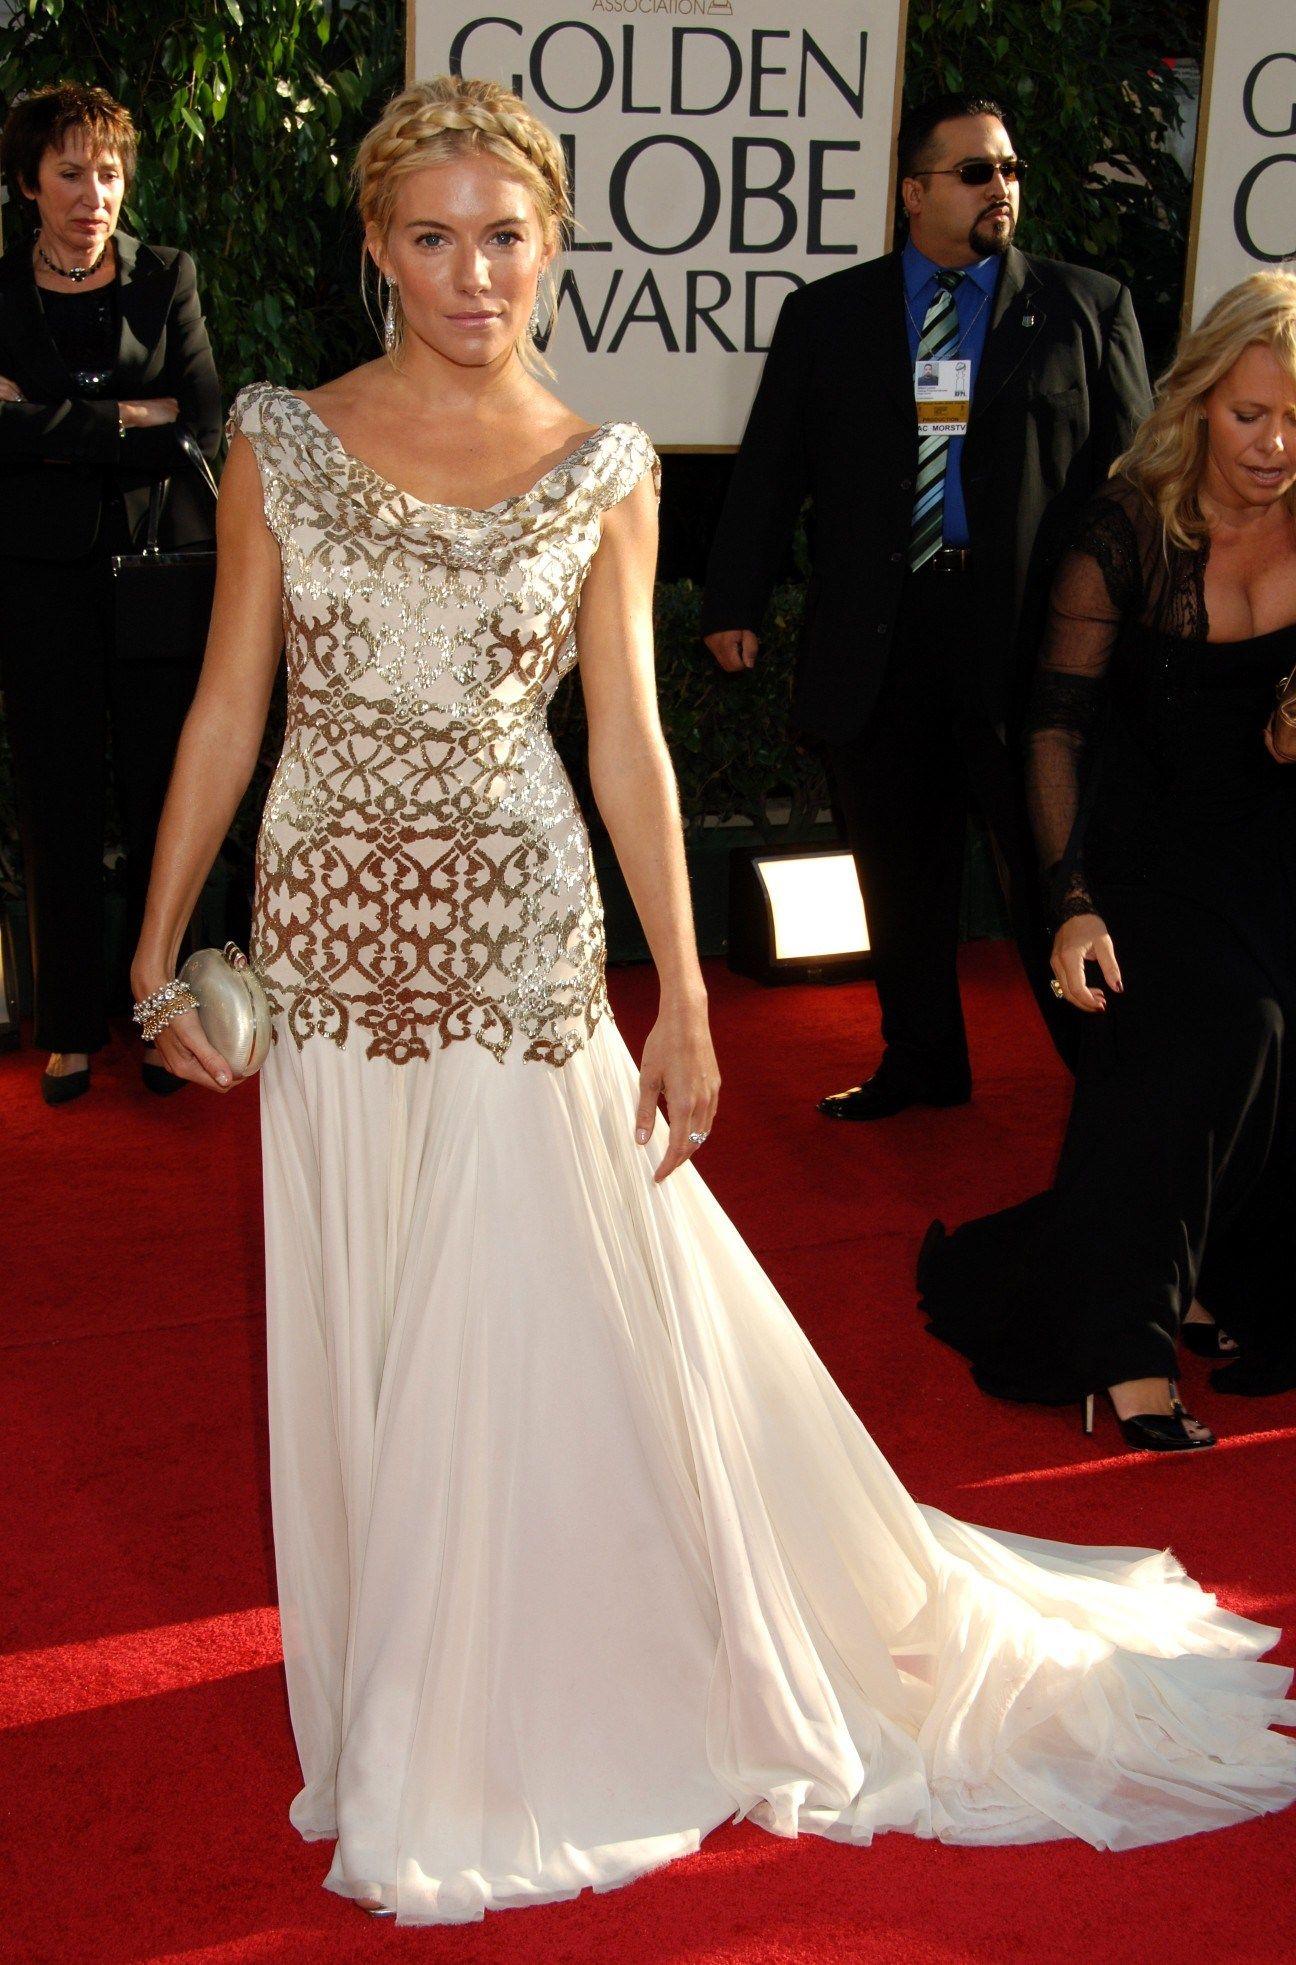 Sienna Miller Red Carpet 4 Red Carpet Gowns Red Carpet Dresses Red Carpet Fashion